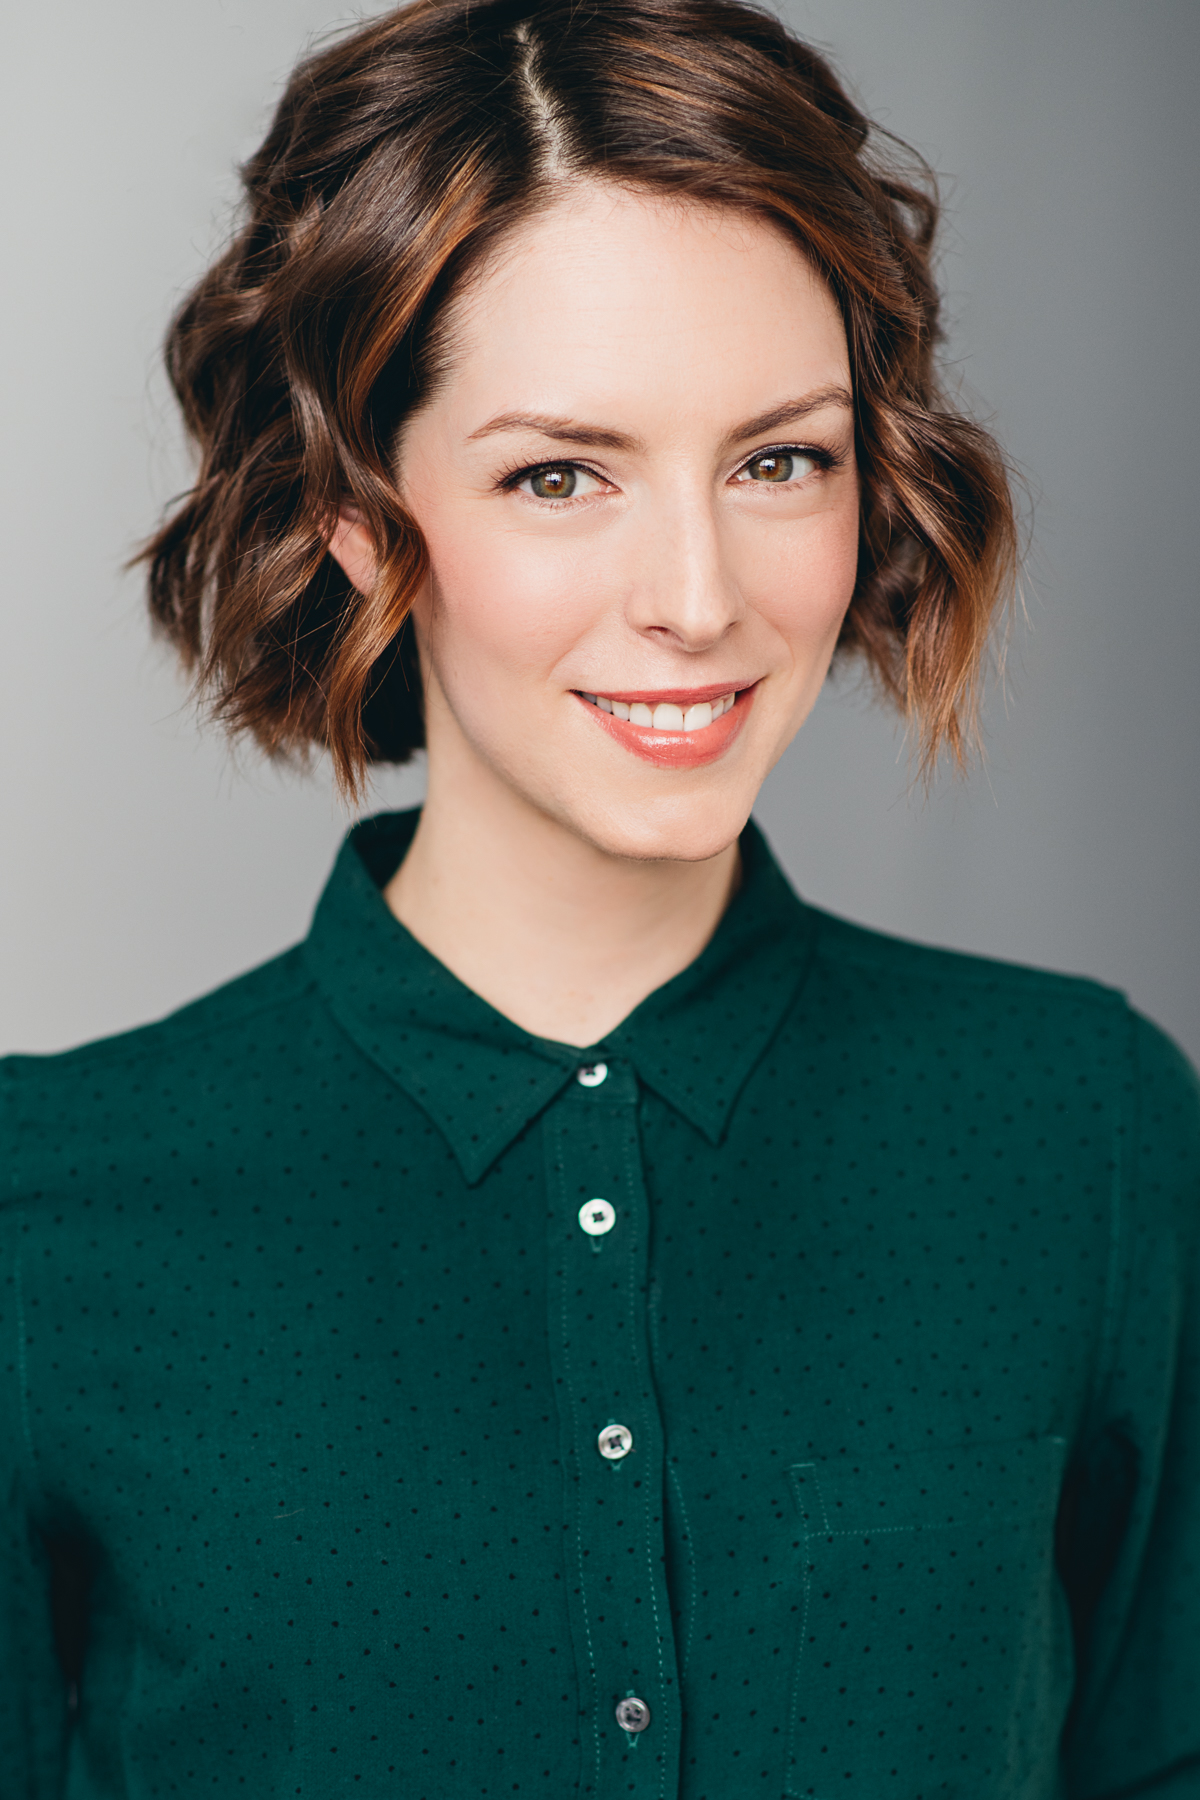 DanielleGetz-LVIMAGERY-5.JPG